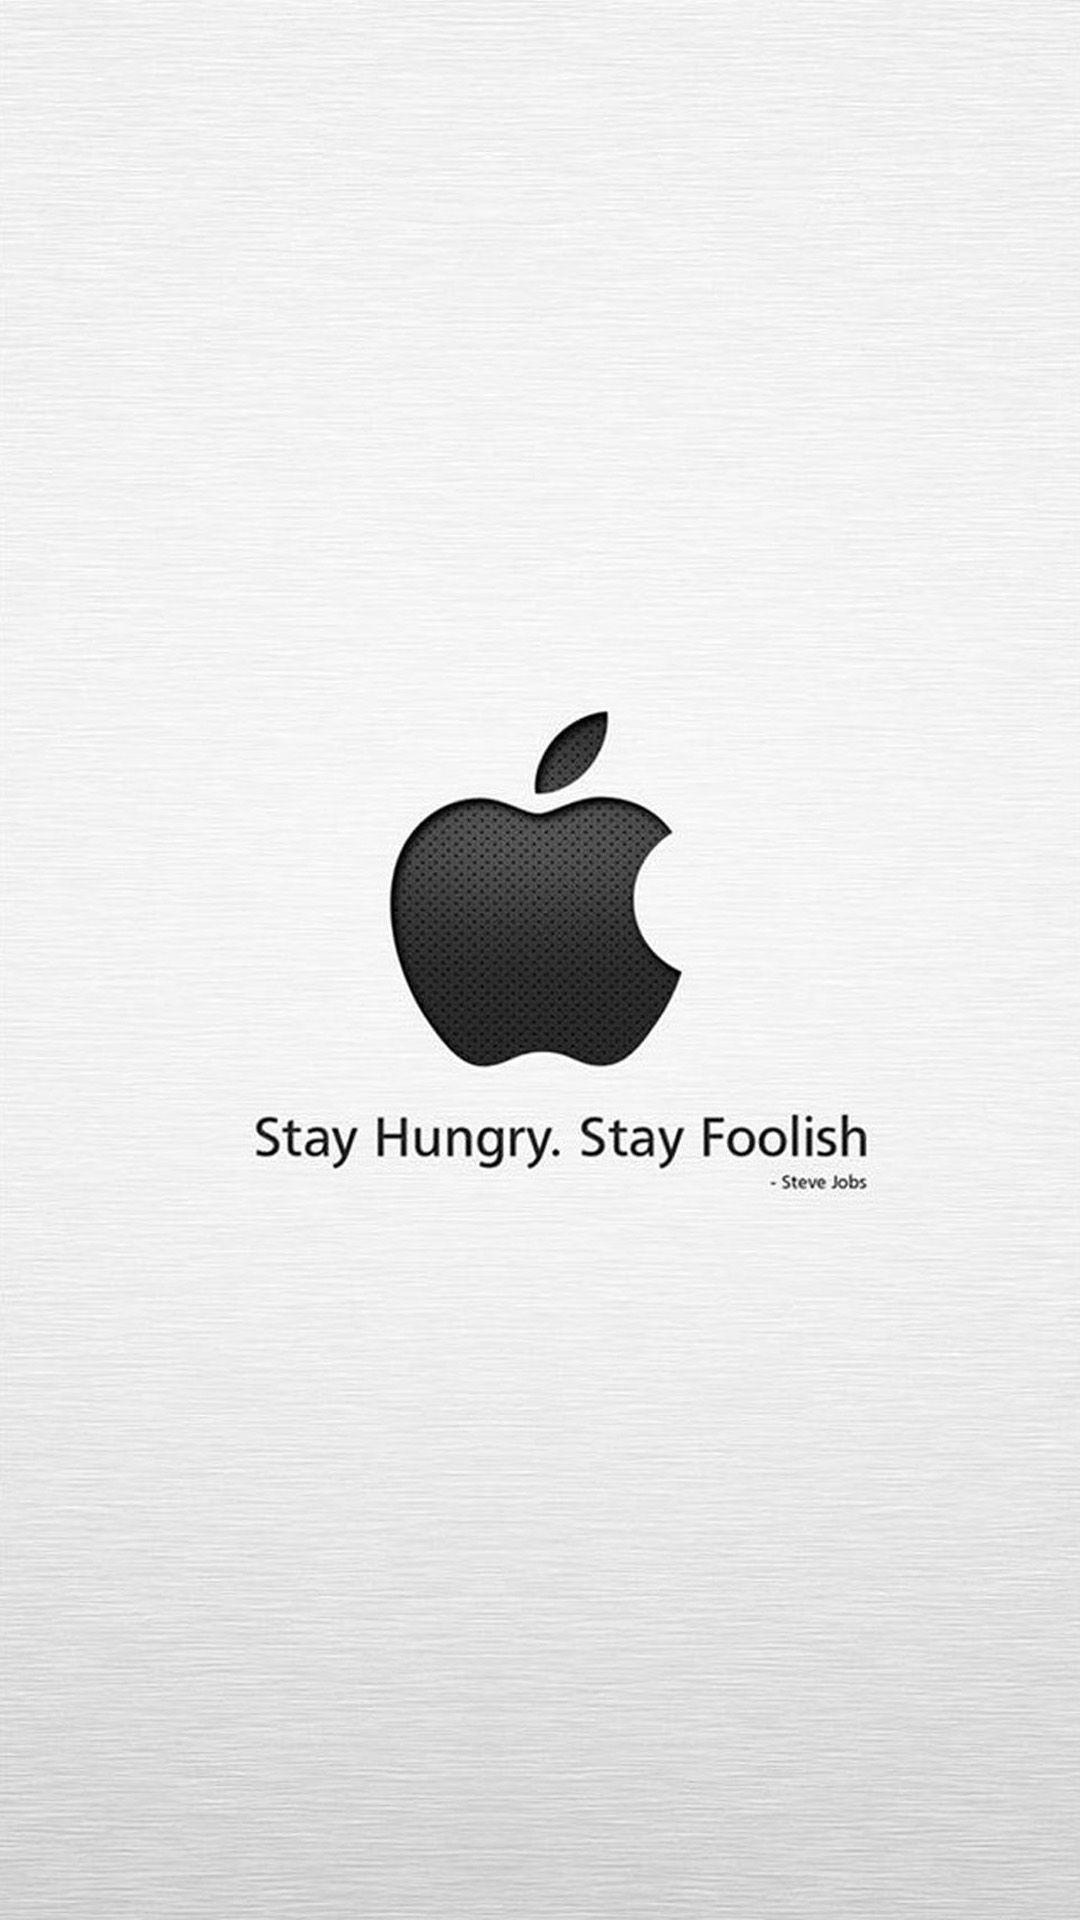 Wallpaper iphone apple logo - Merry Christmas Iphone Wallpaper